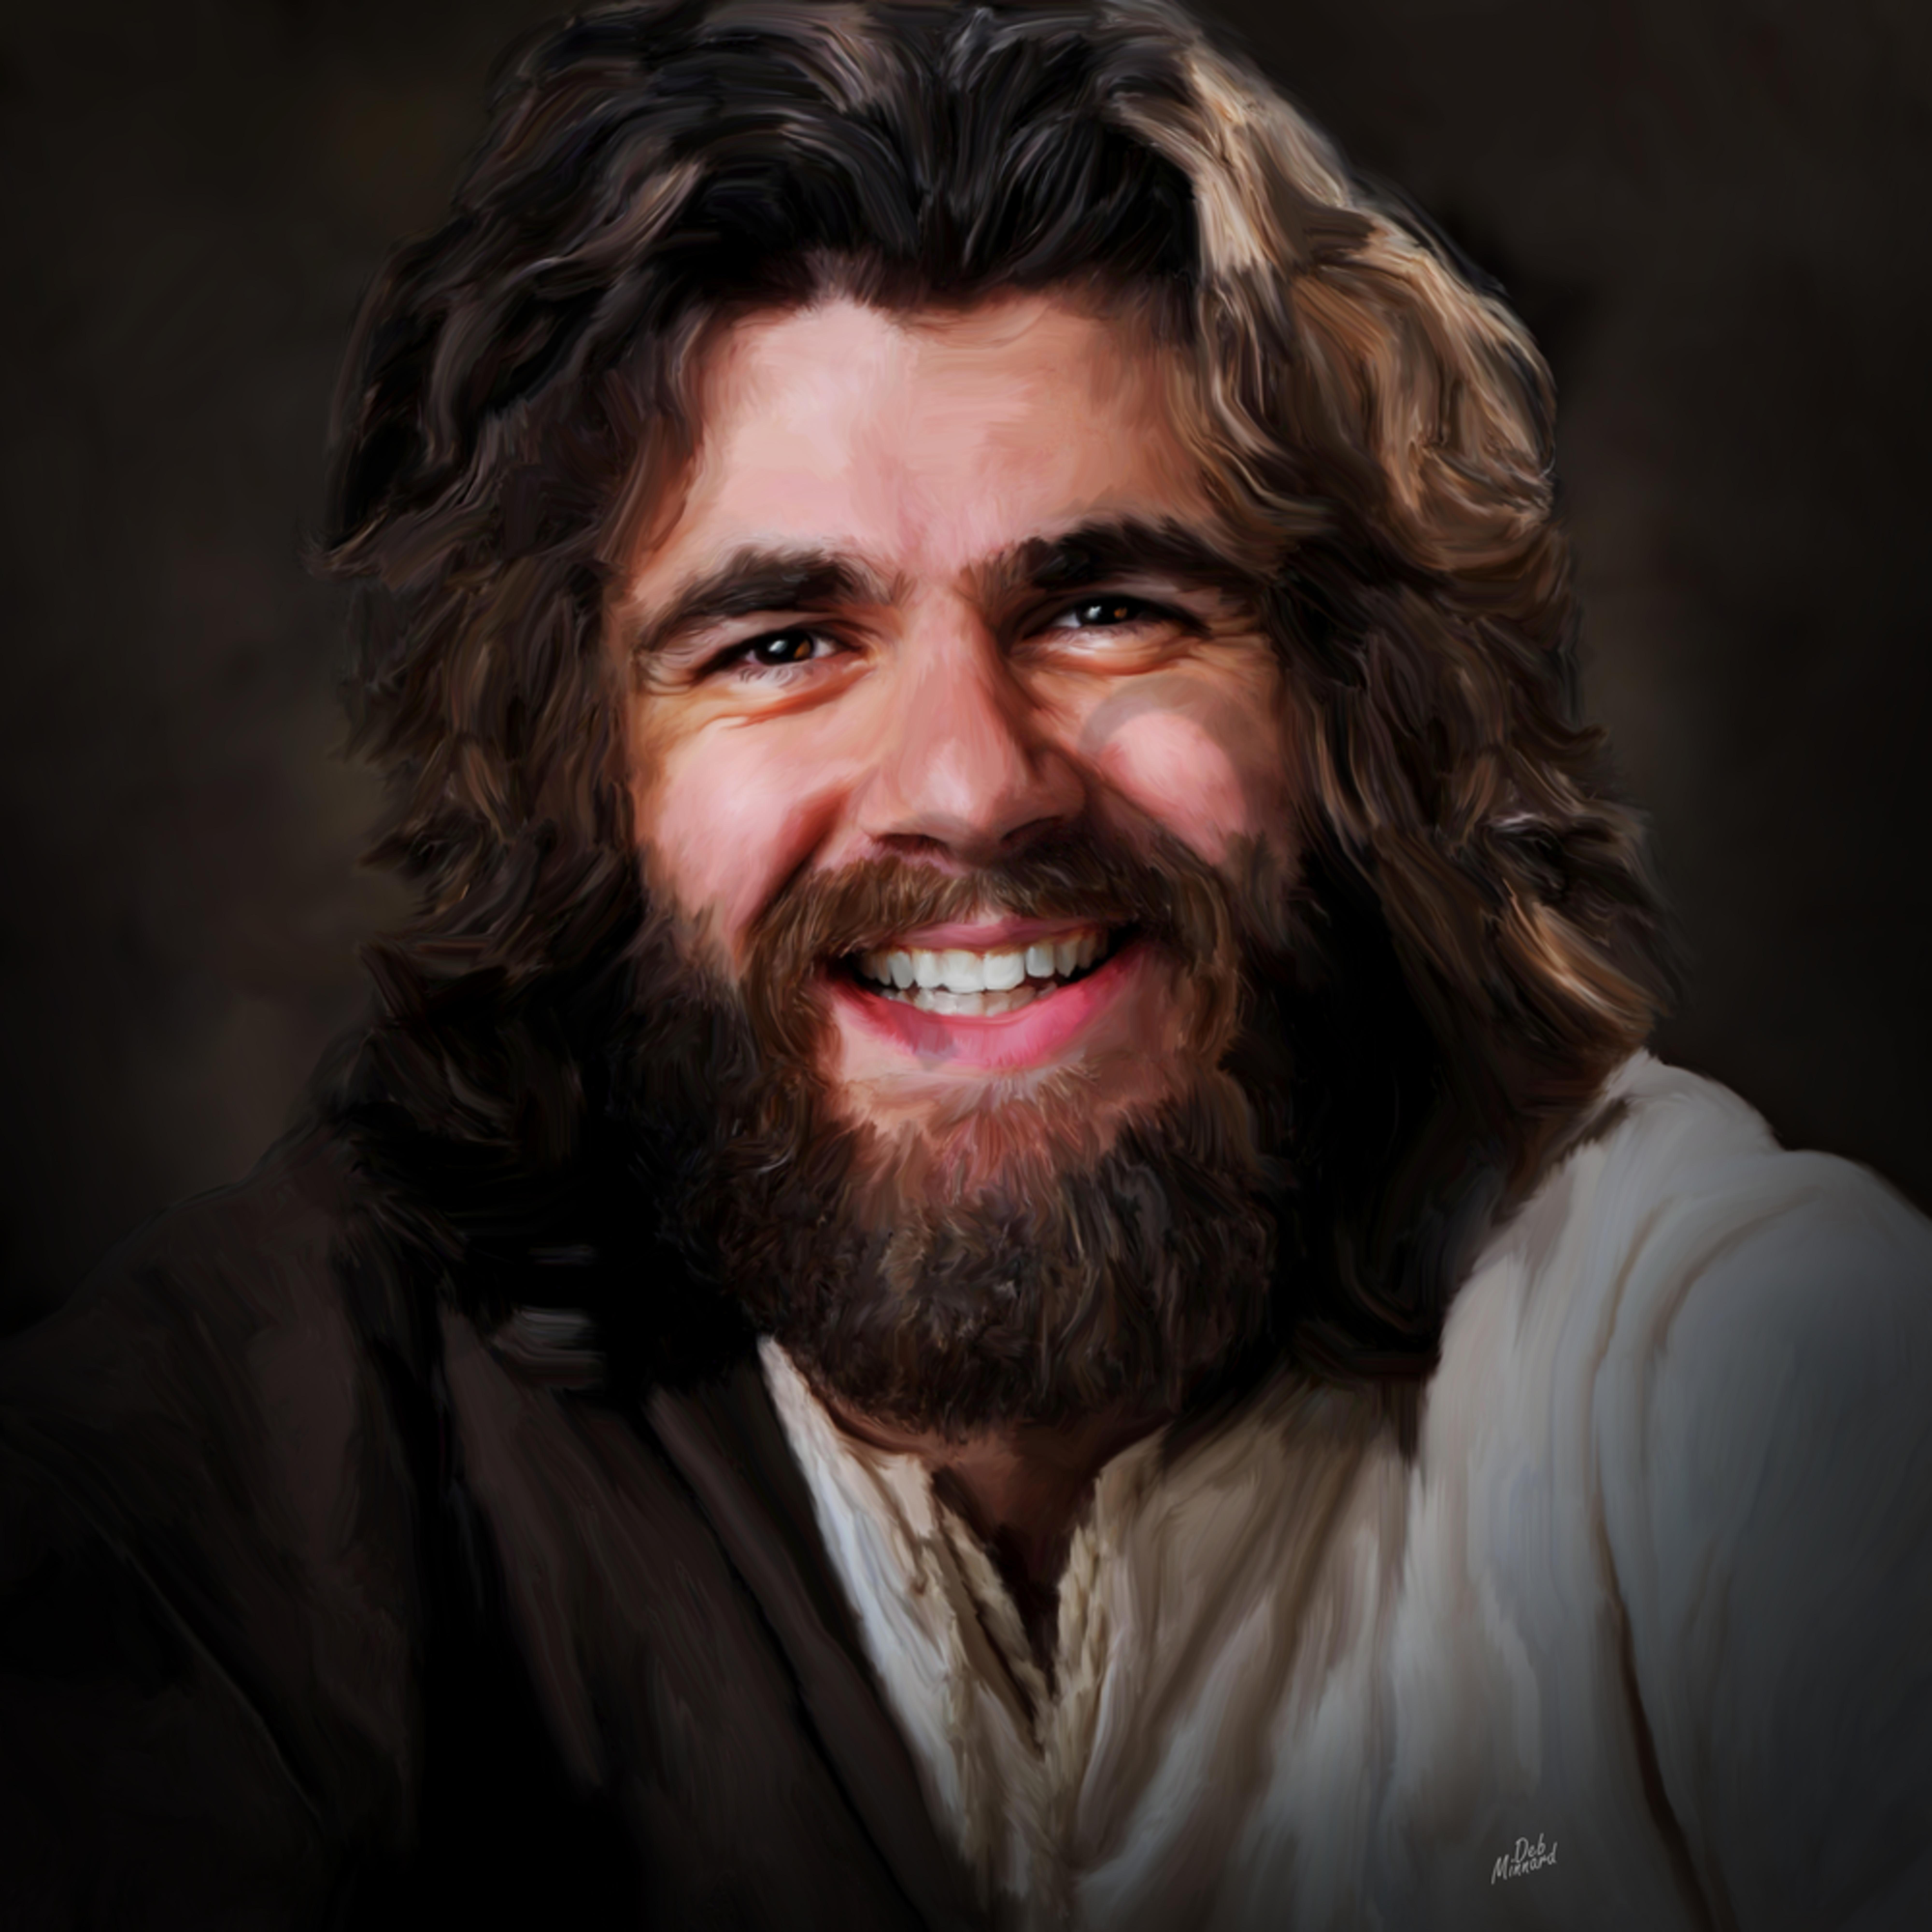 Jesus happy to see you xuzrrm